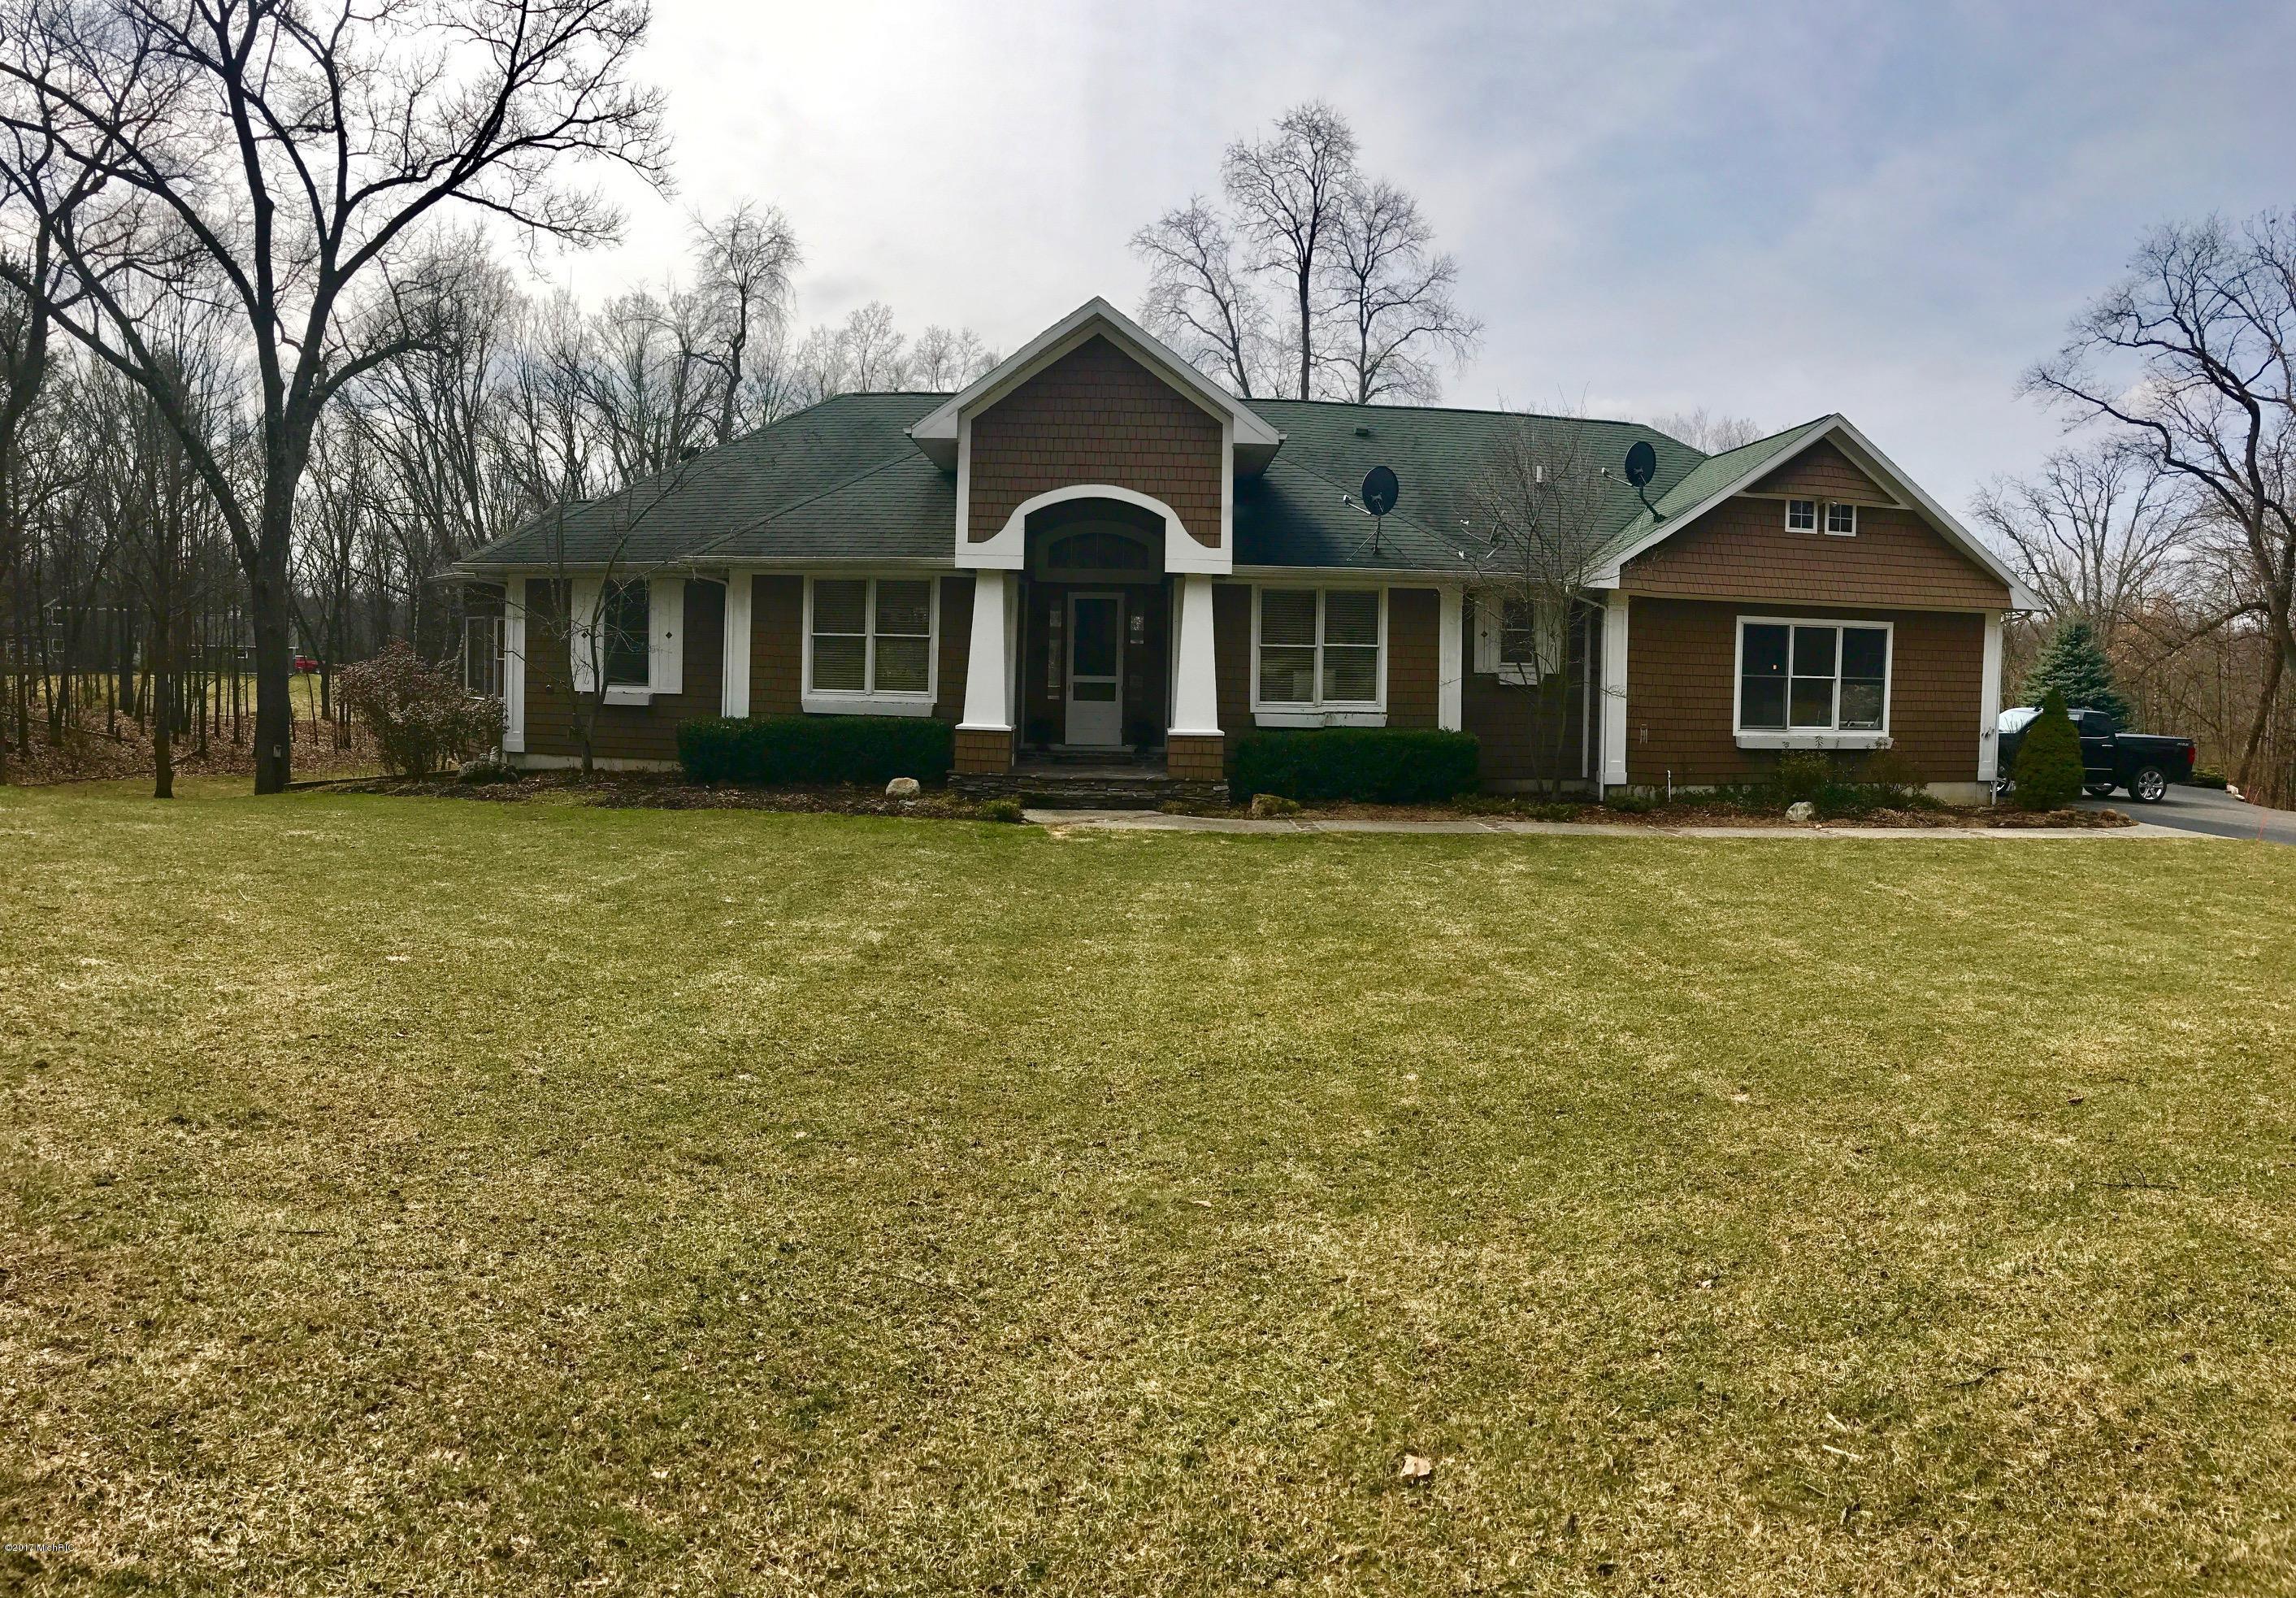 Single Family Home for Sale at 1300 Cramton Avenue Ada, Michigan 49301 United States